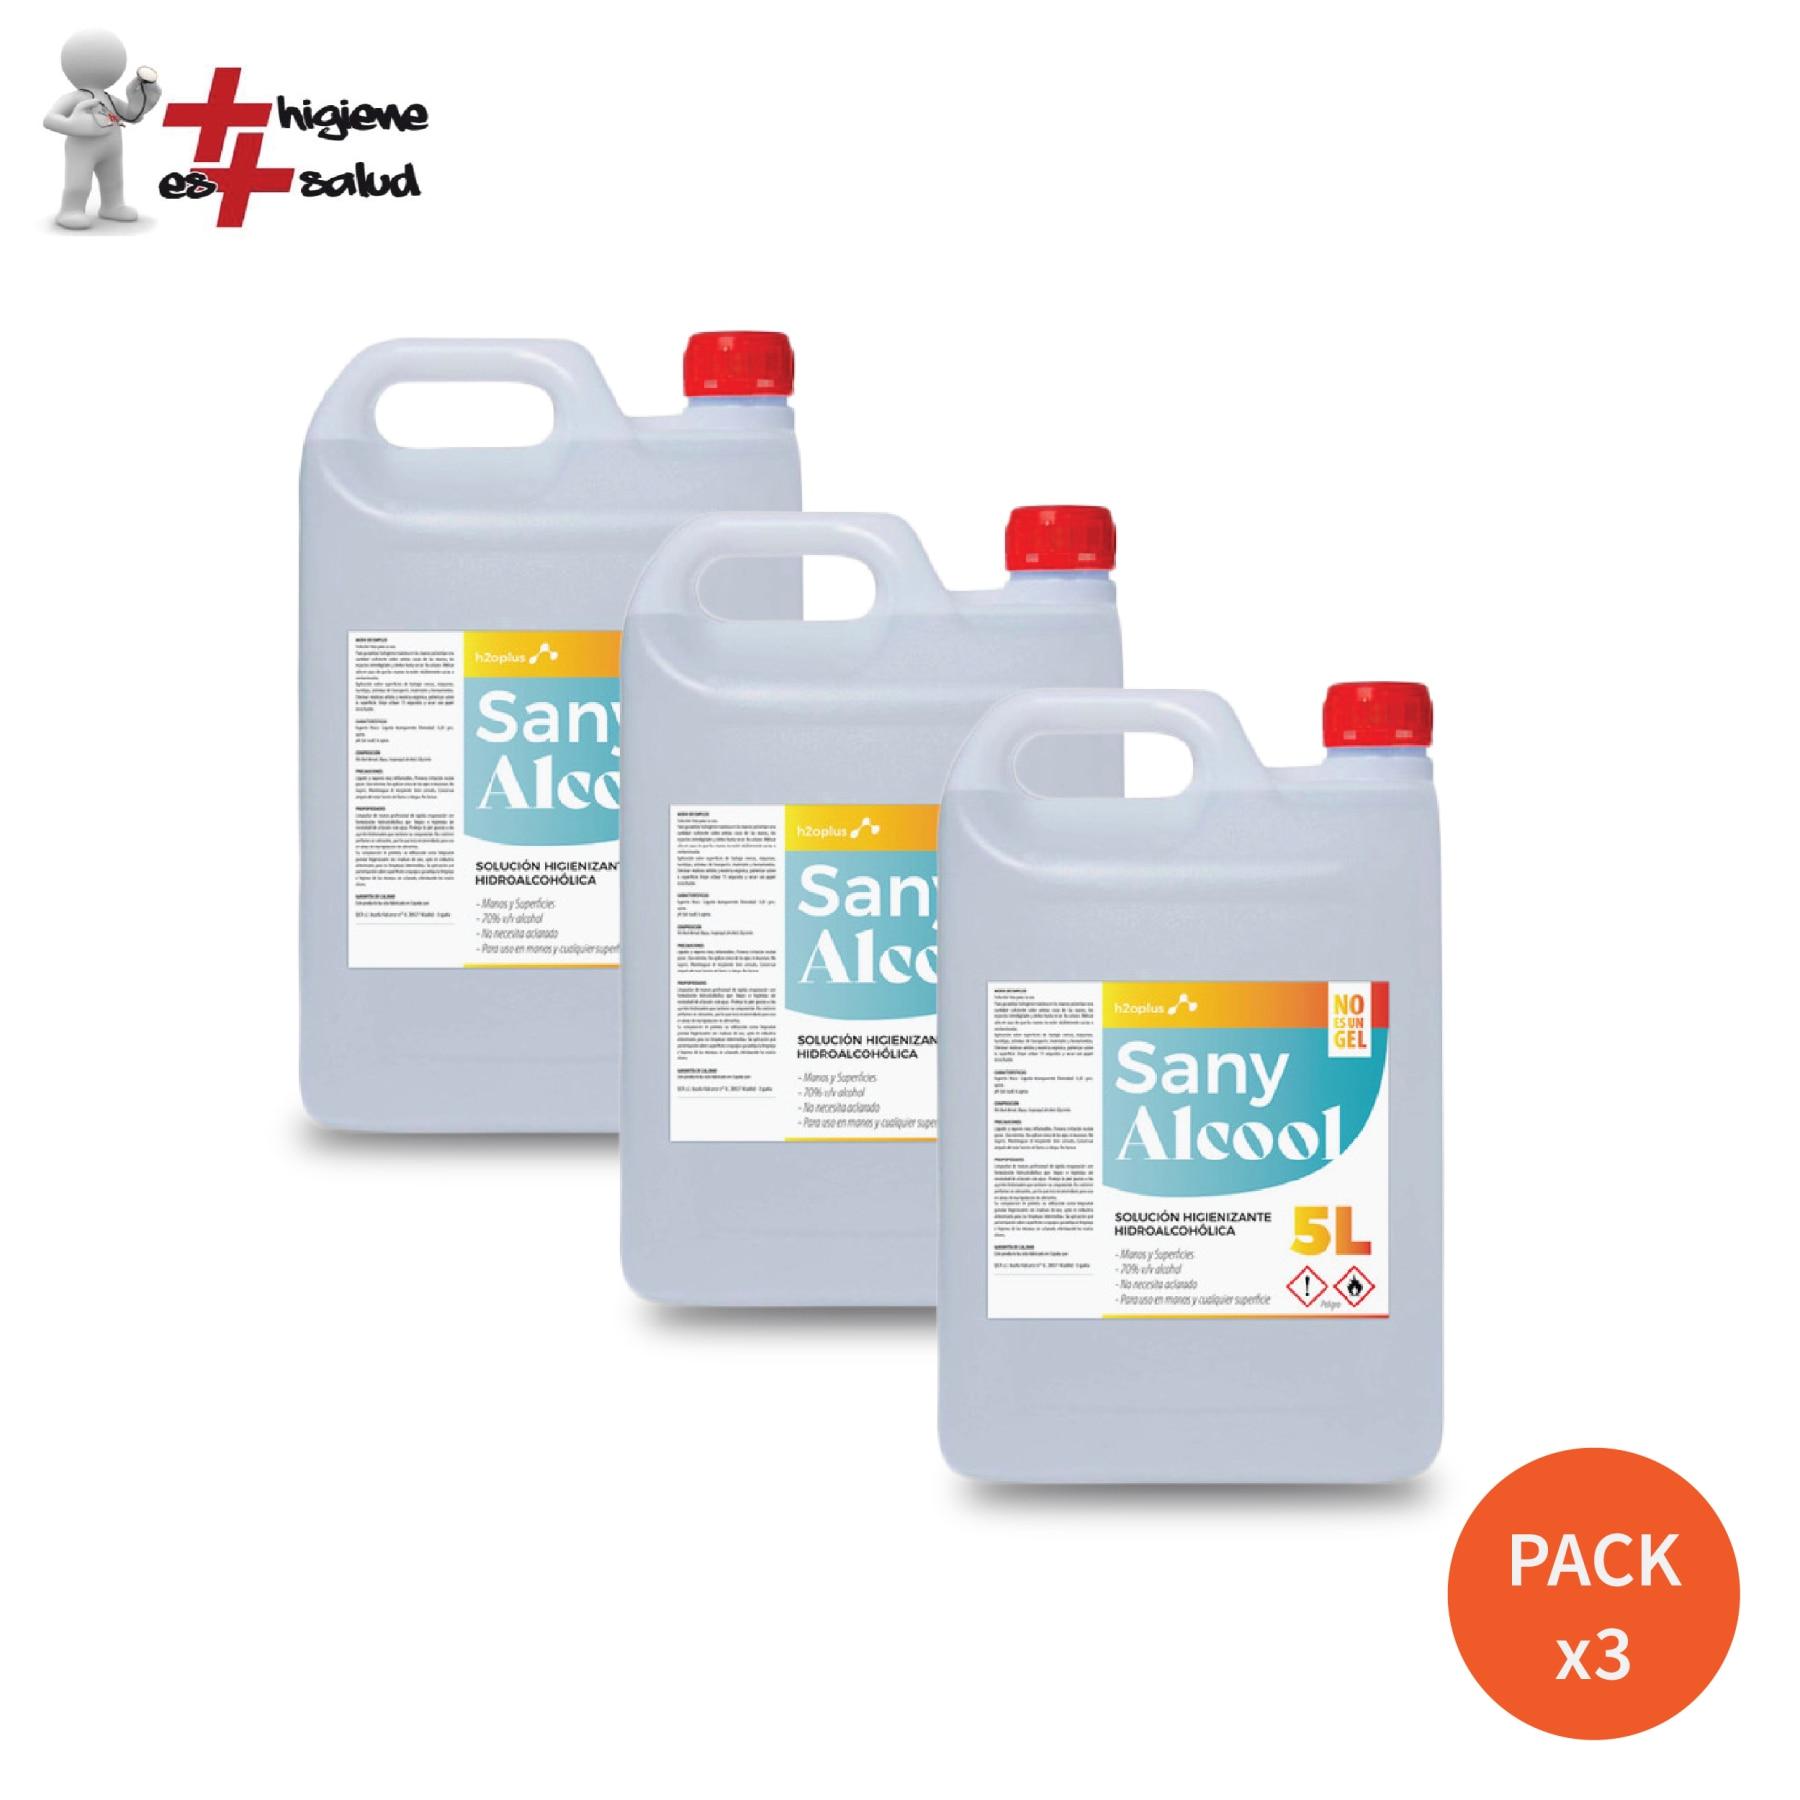 Sany Alcool - 3 X Liquid Sanitizing Hydroalcoholic Antiseptic 5 Liters